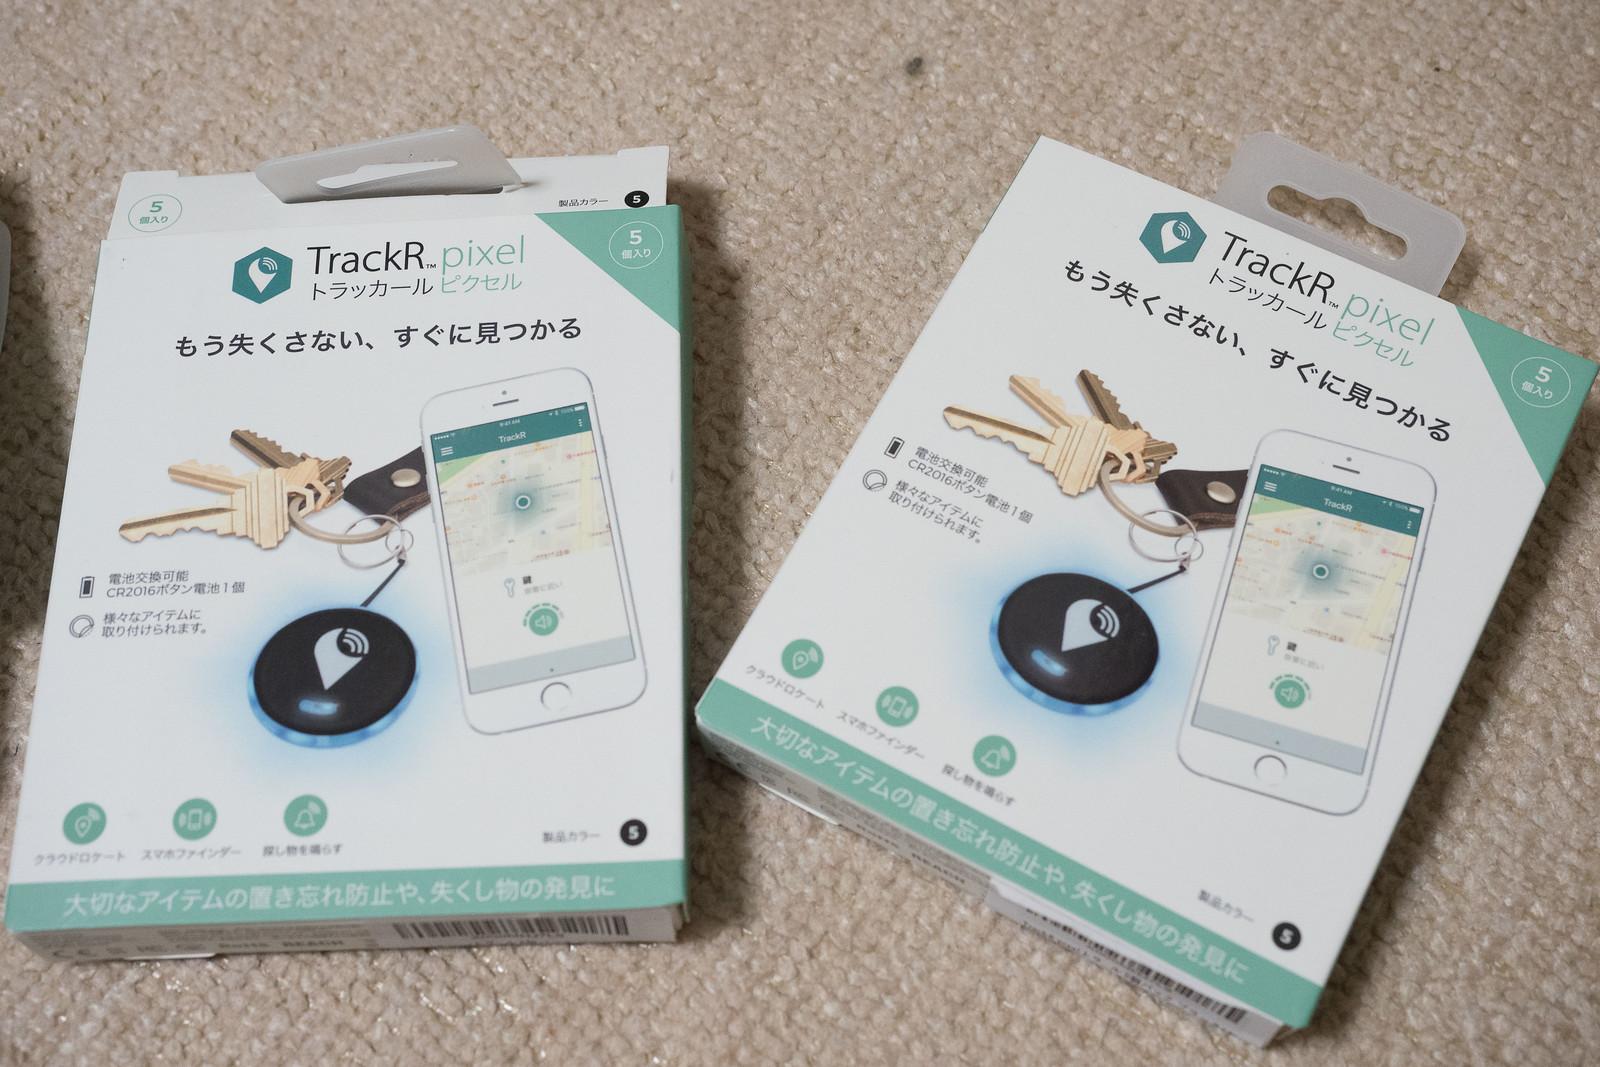 TrackR_pixel-1